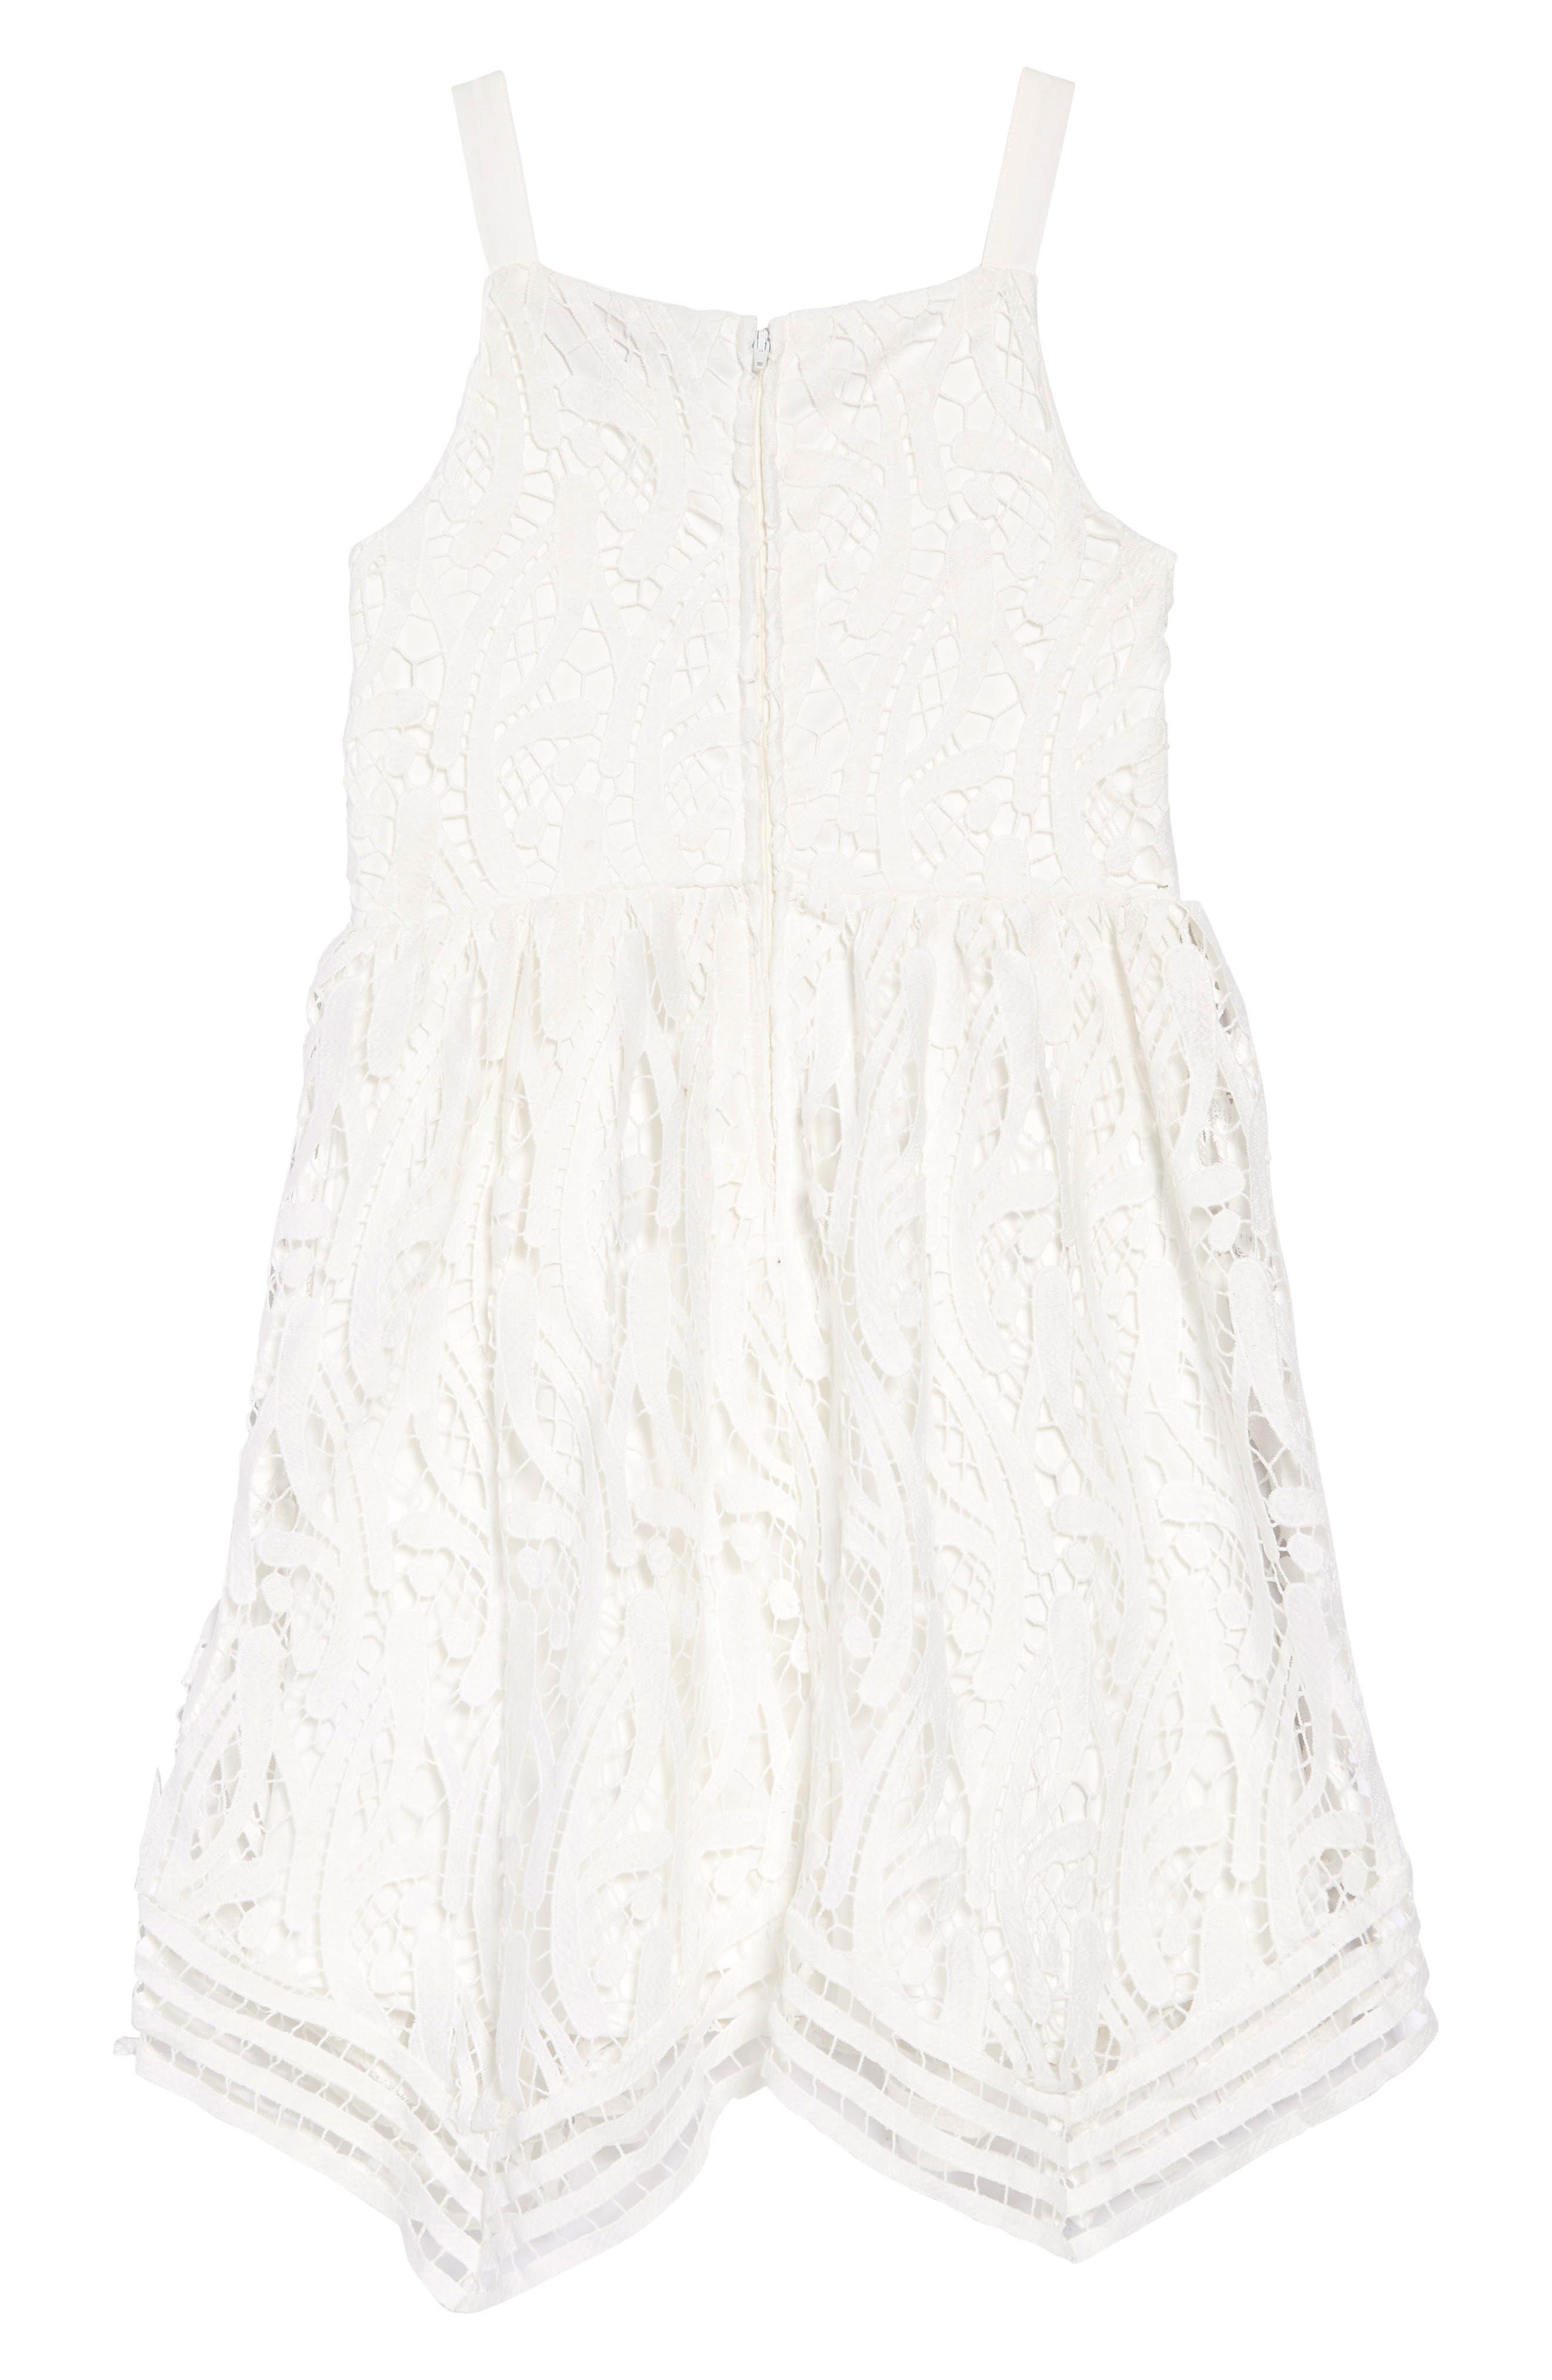 TRIXXI, Guipure Lace Dress, Alternate thumbnail 2, color, WHITE